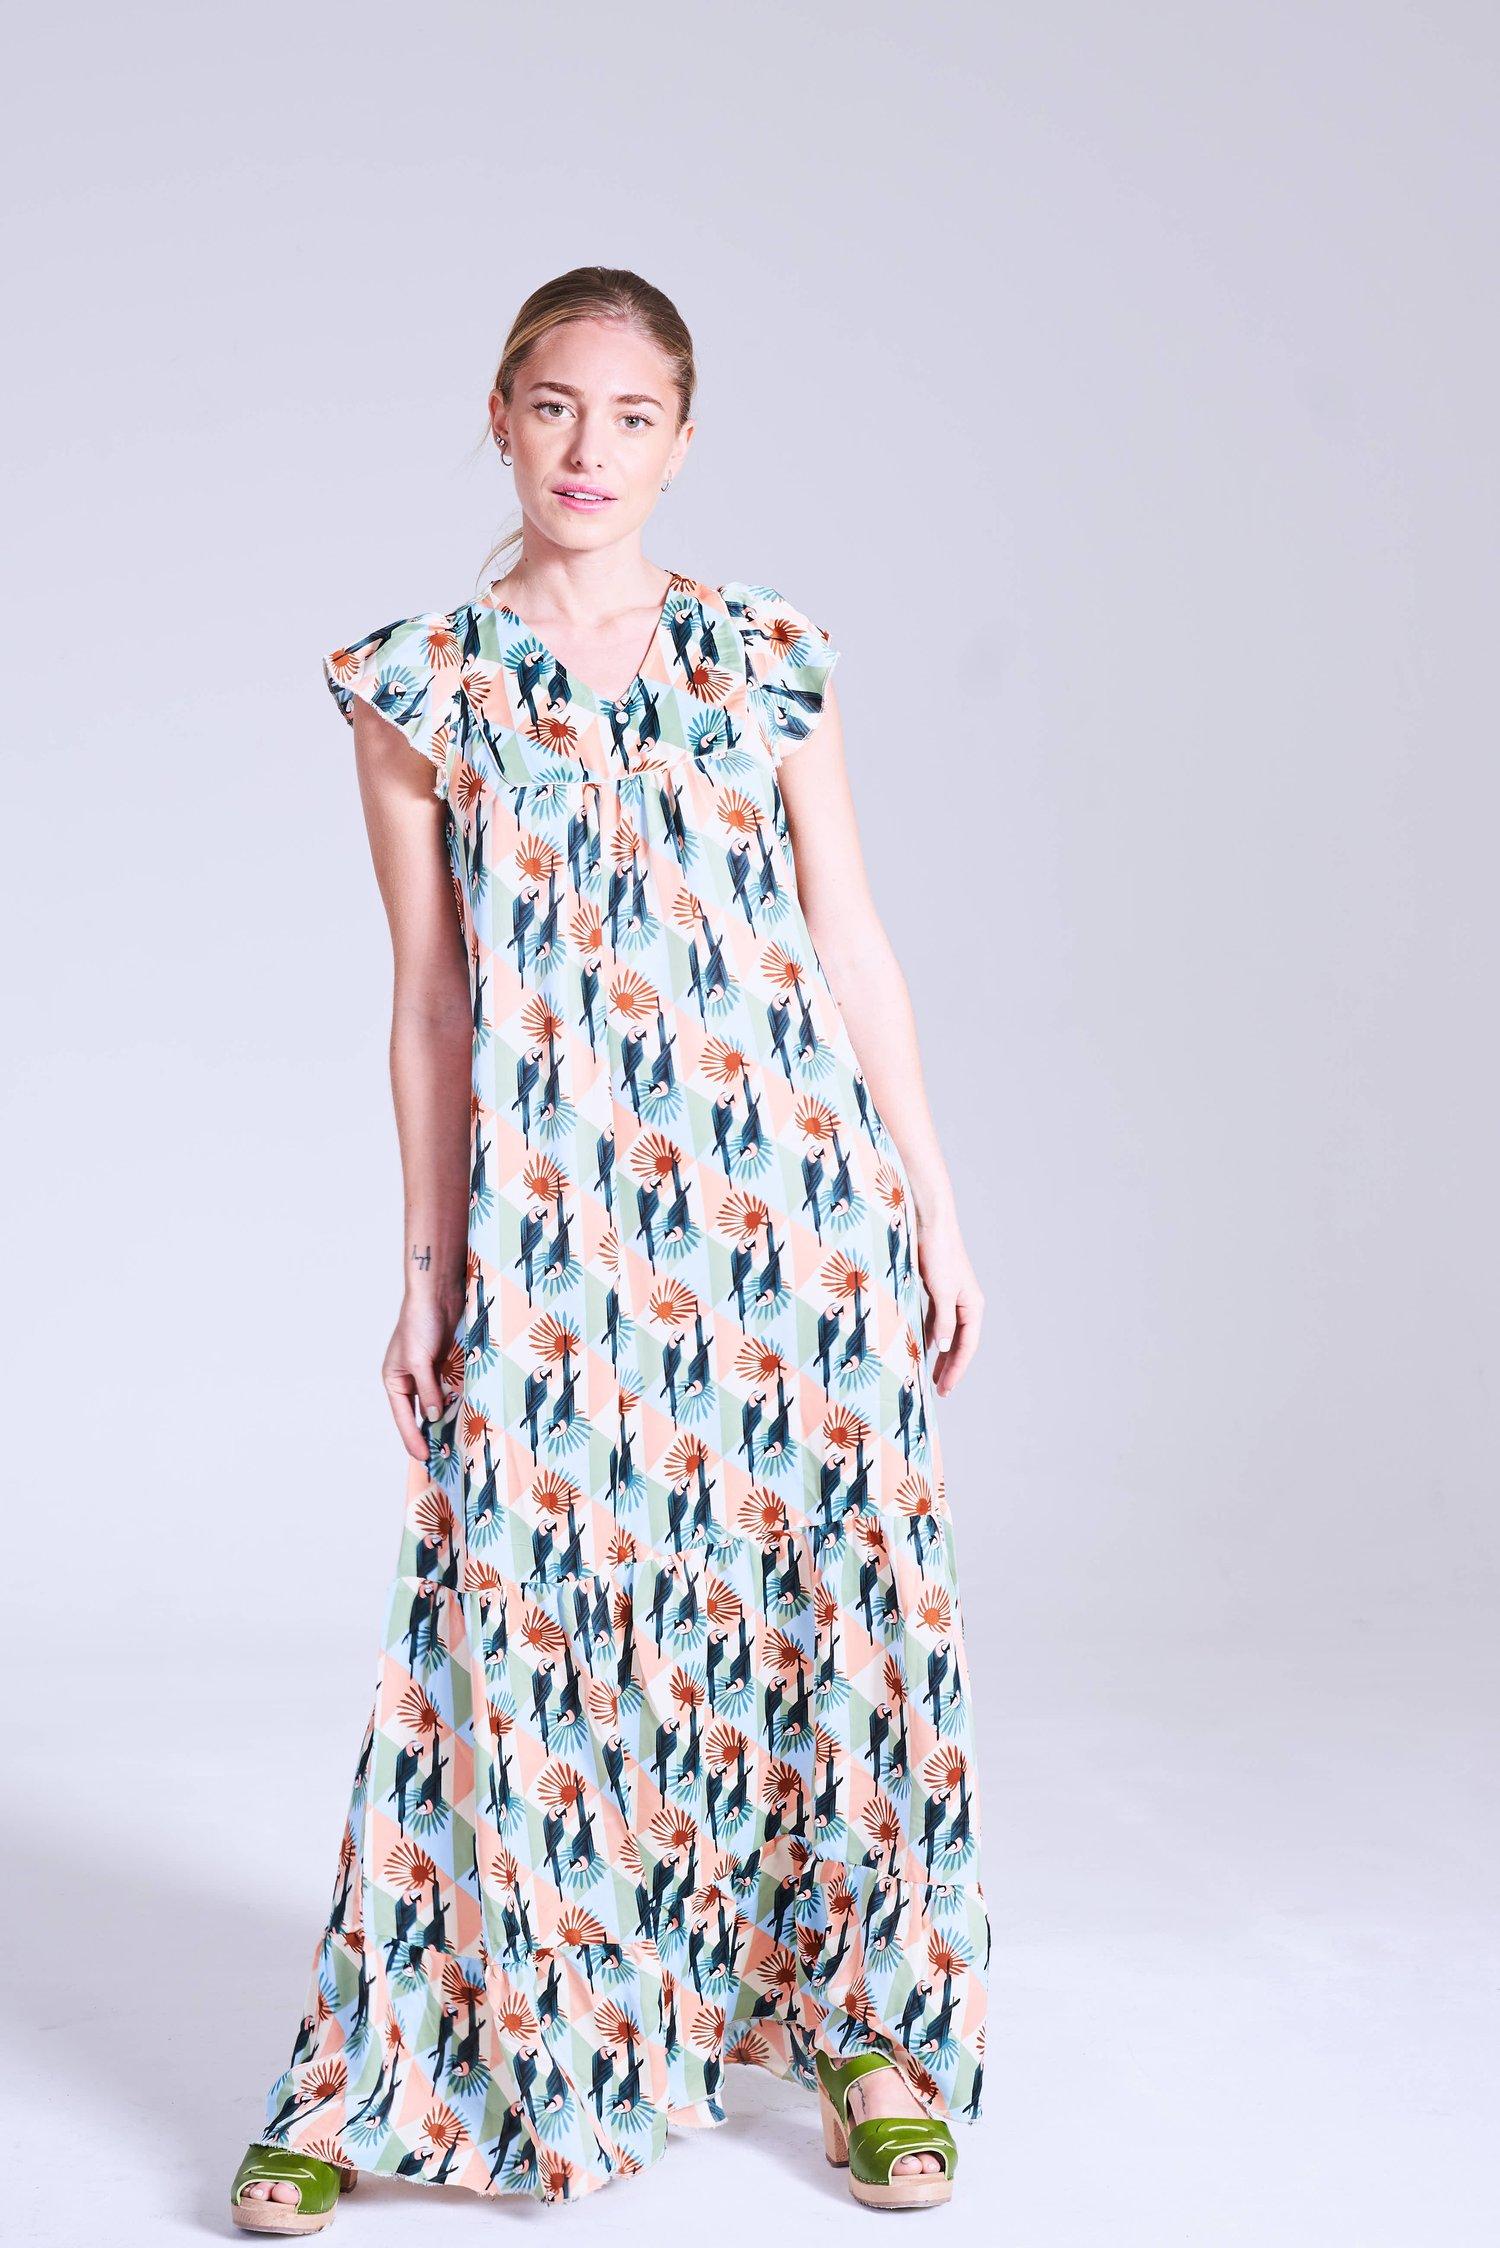 Image of Vestido Mujeres Green Loro